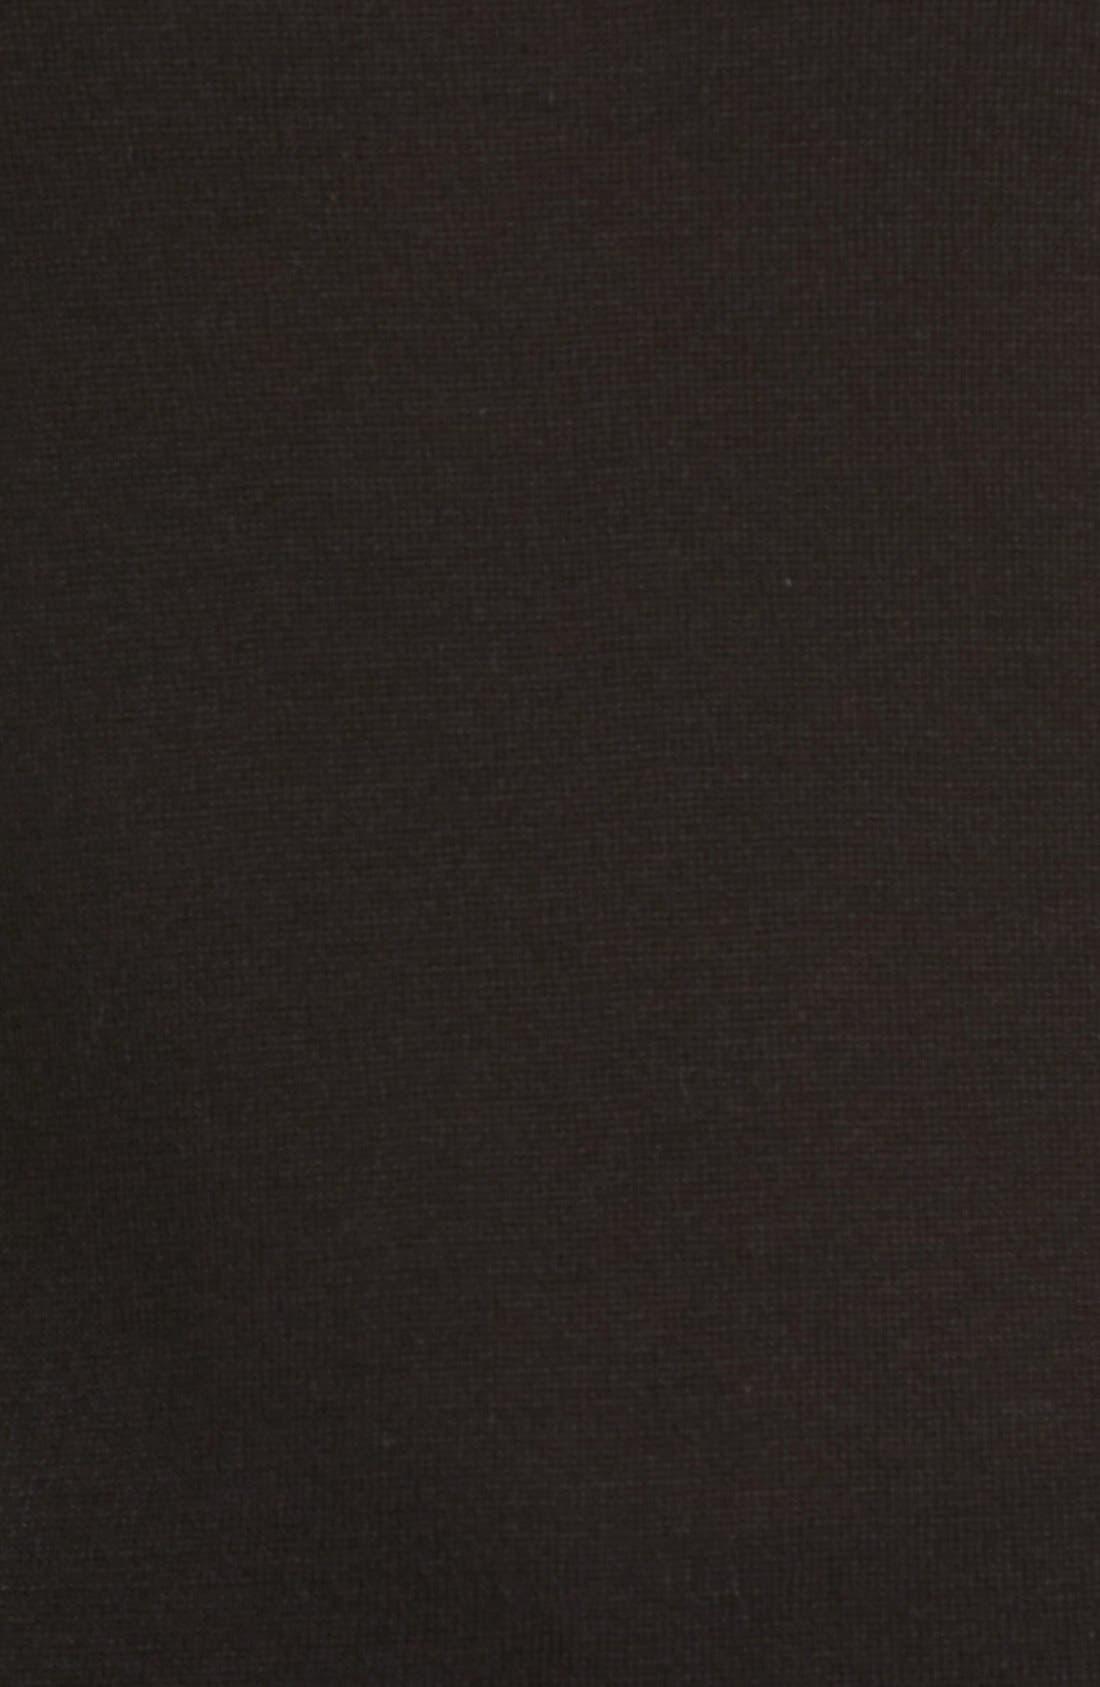 Cotton Blend Pullover,                             Alternate thumbnail 167, color,